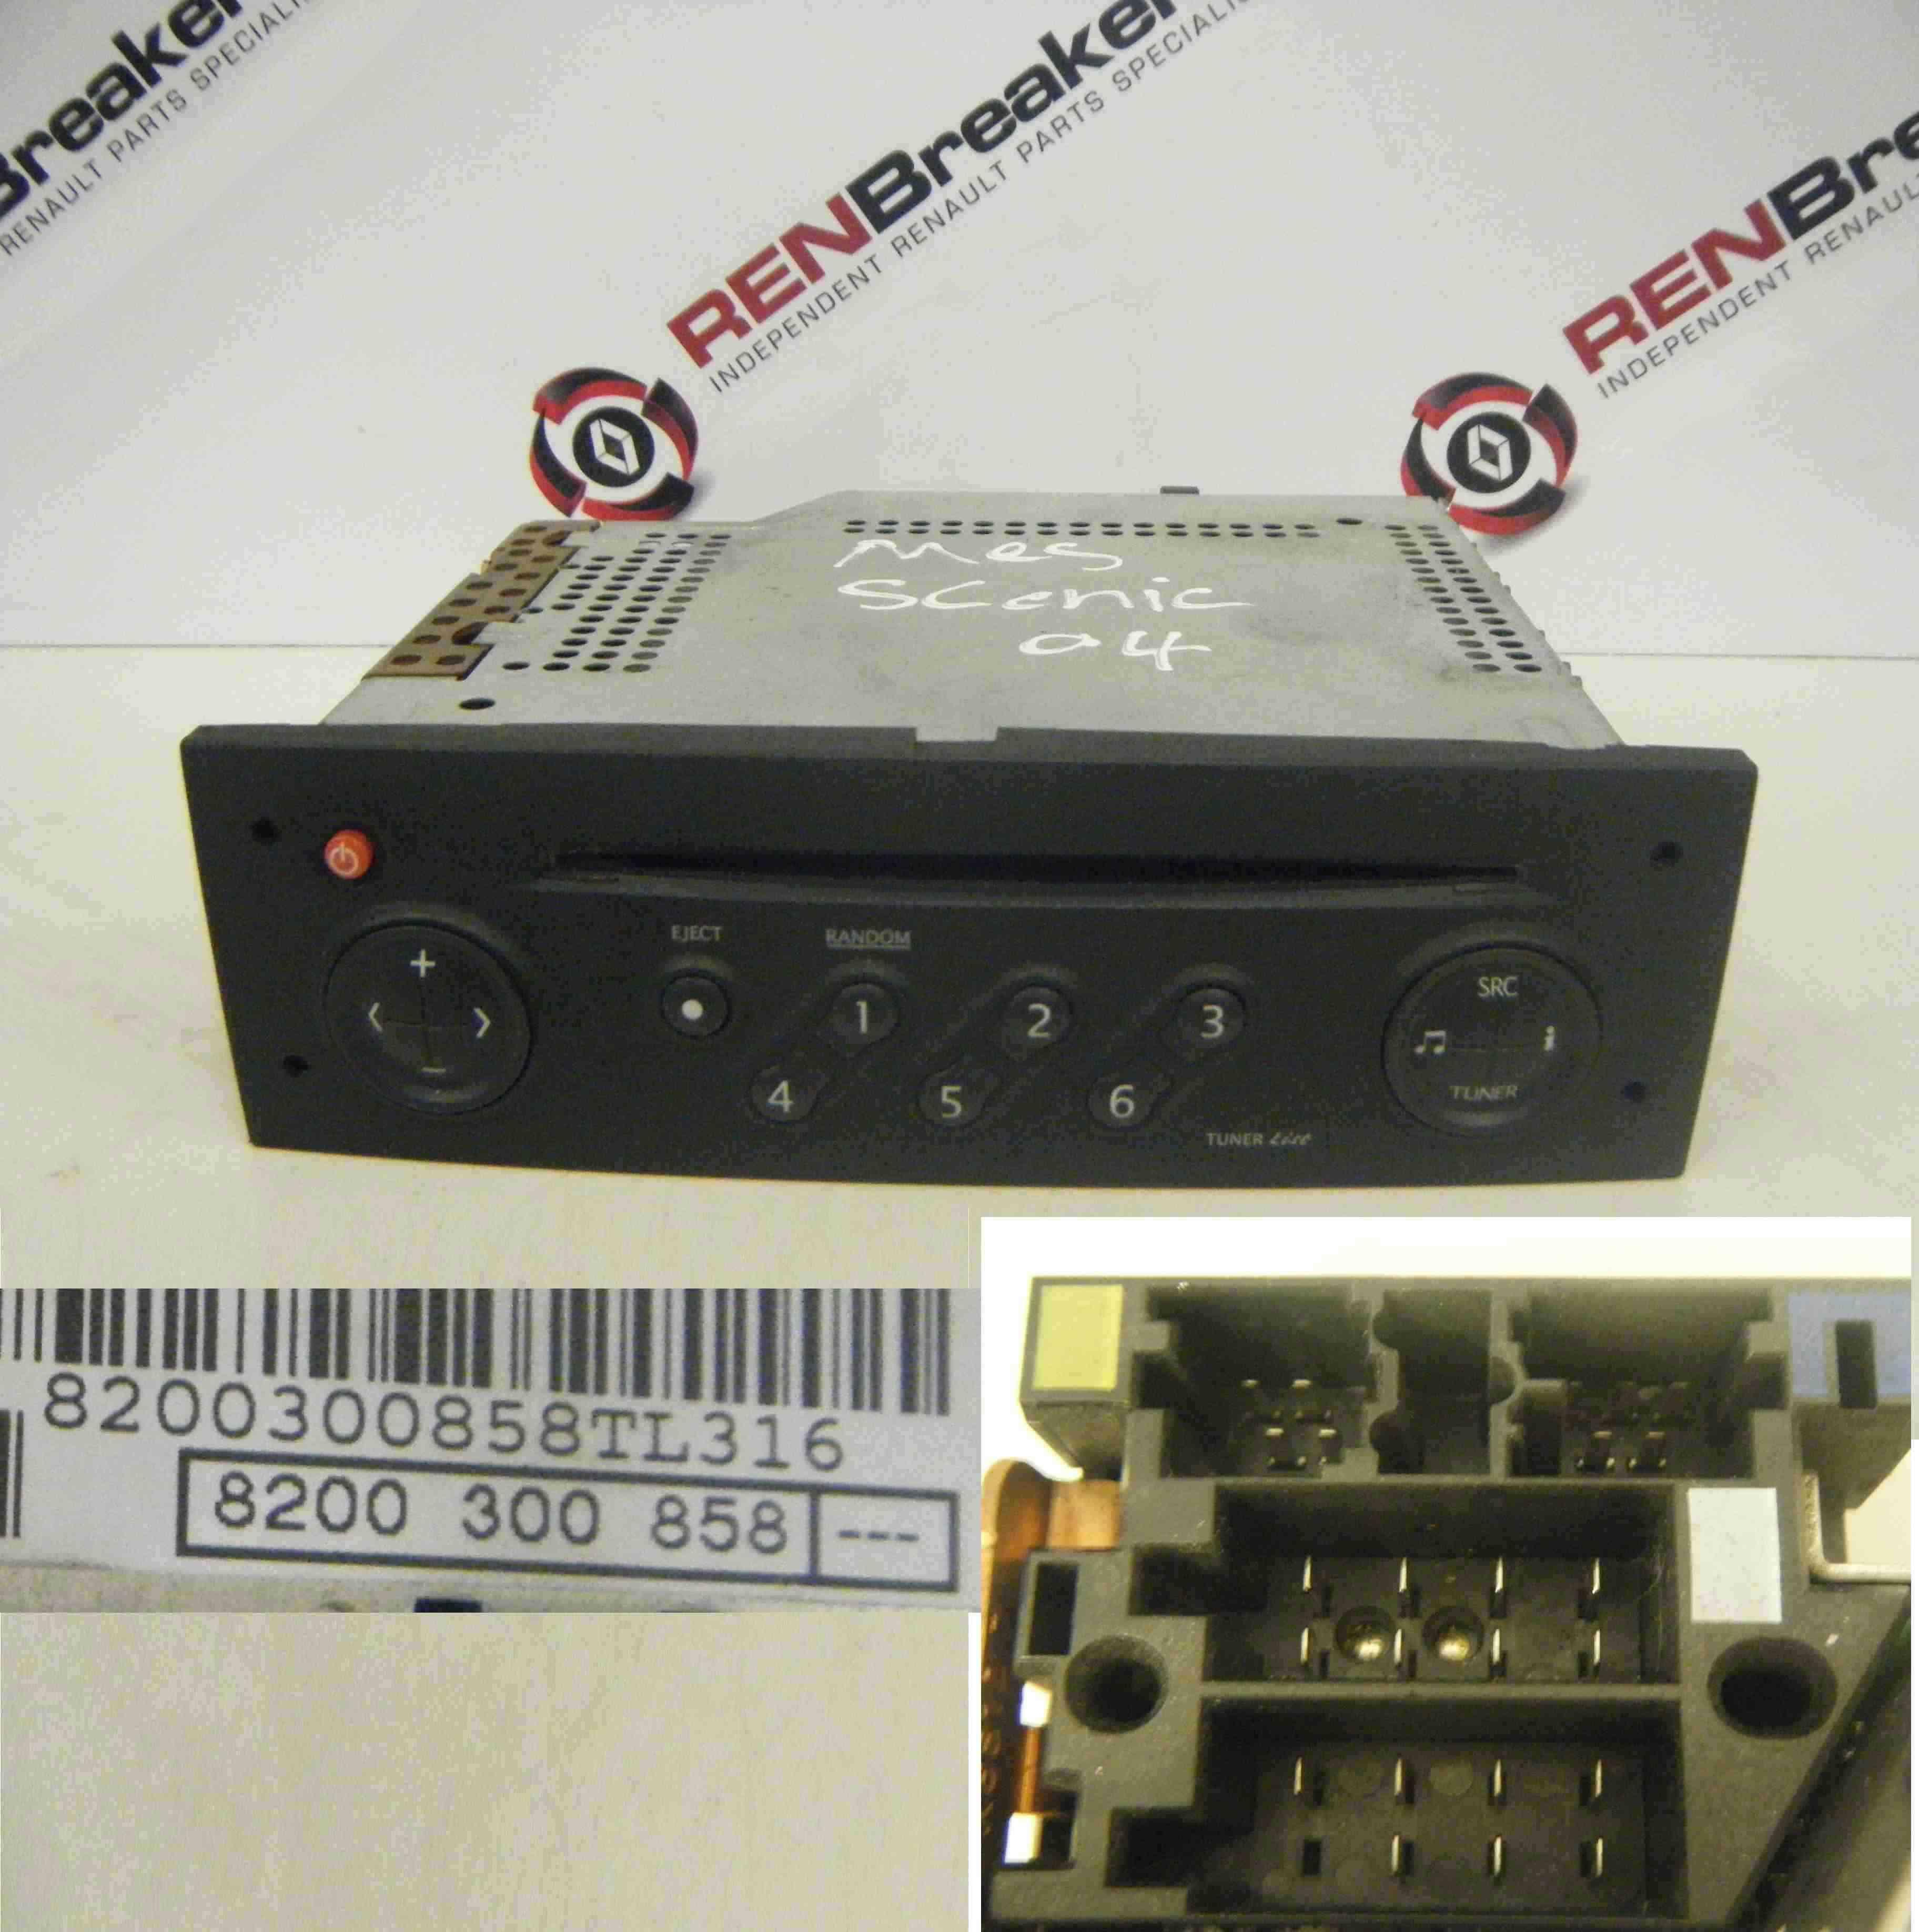 Renault Grand Scenic 2003-2009 CD Player Tuner List Black + Code 8200300858